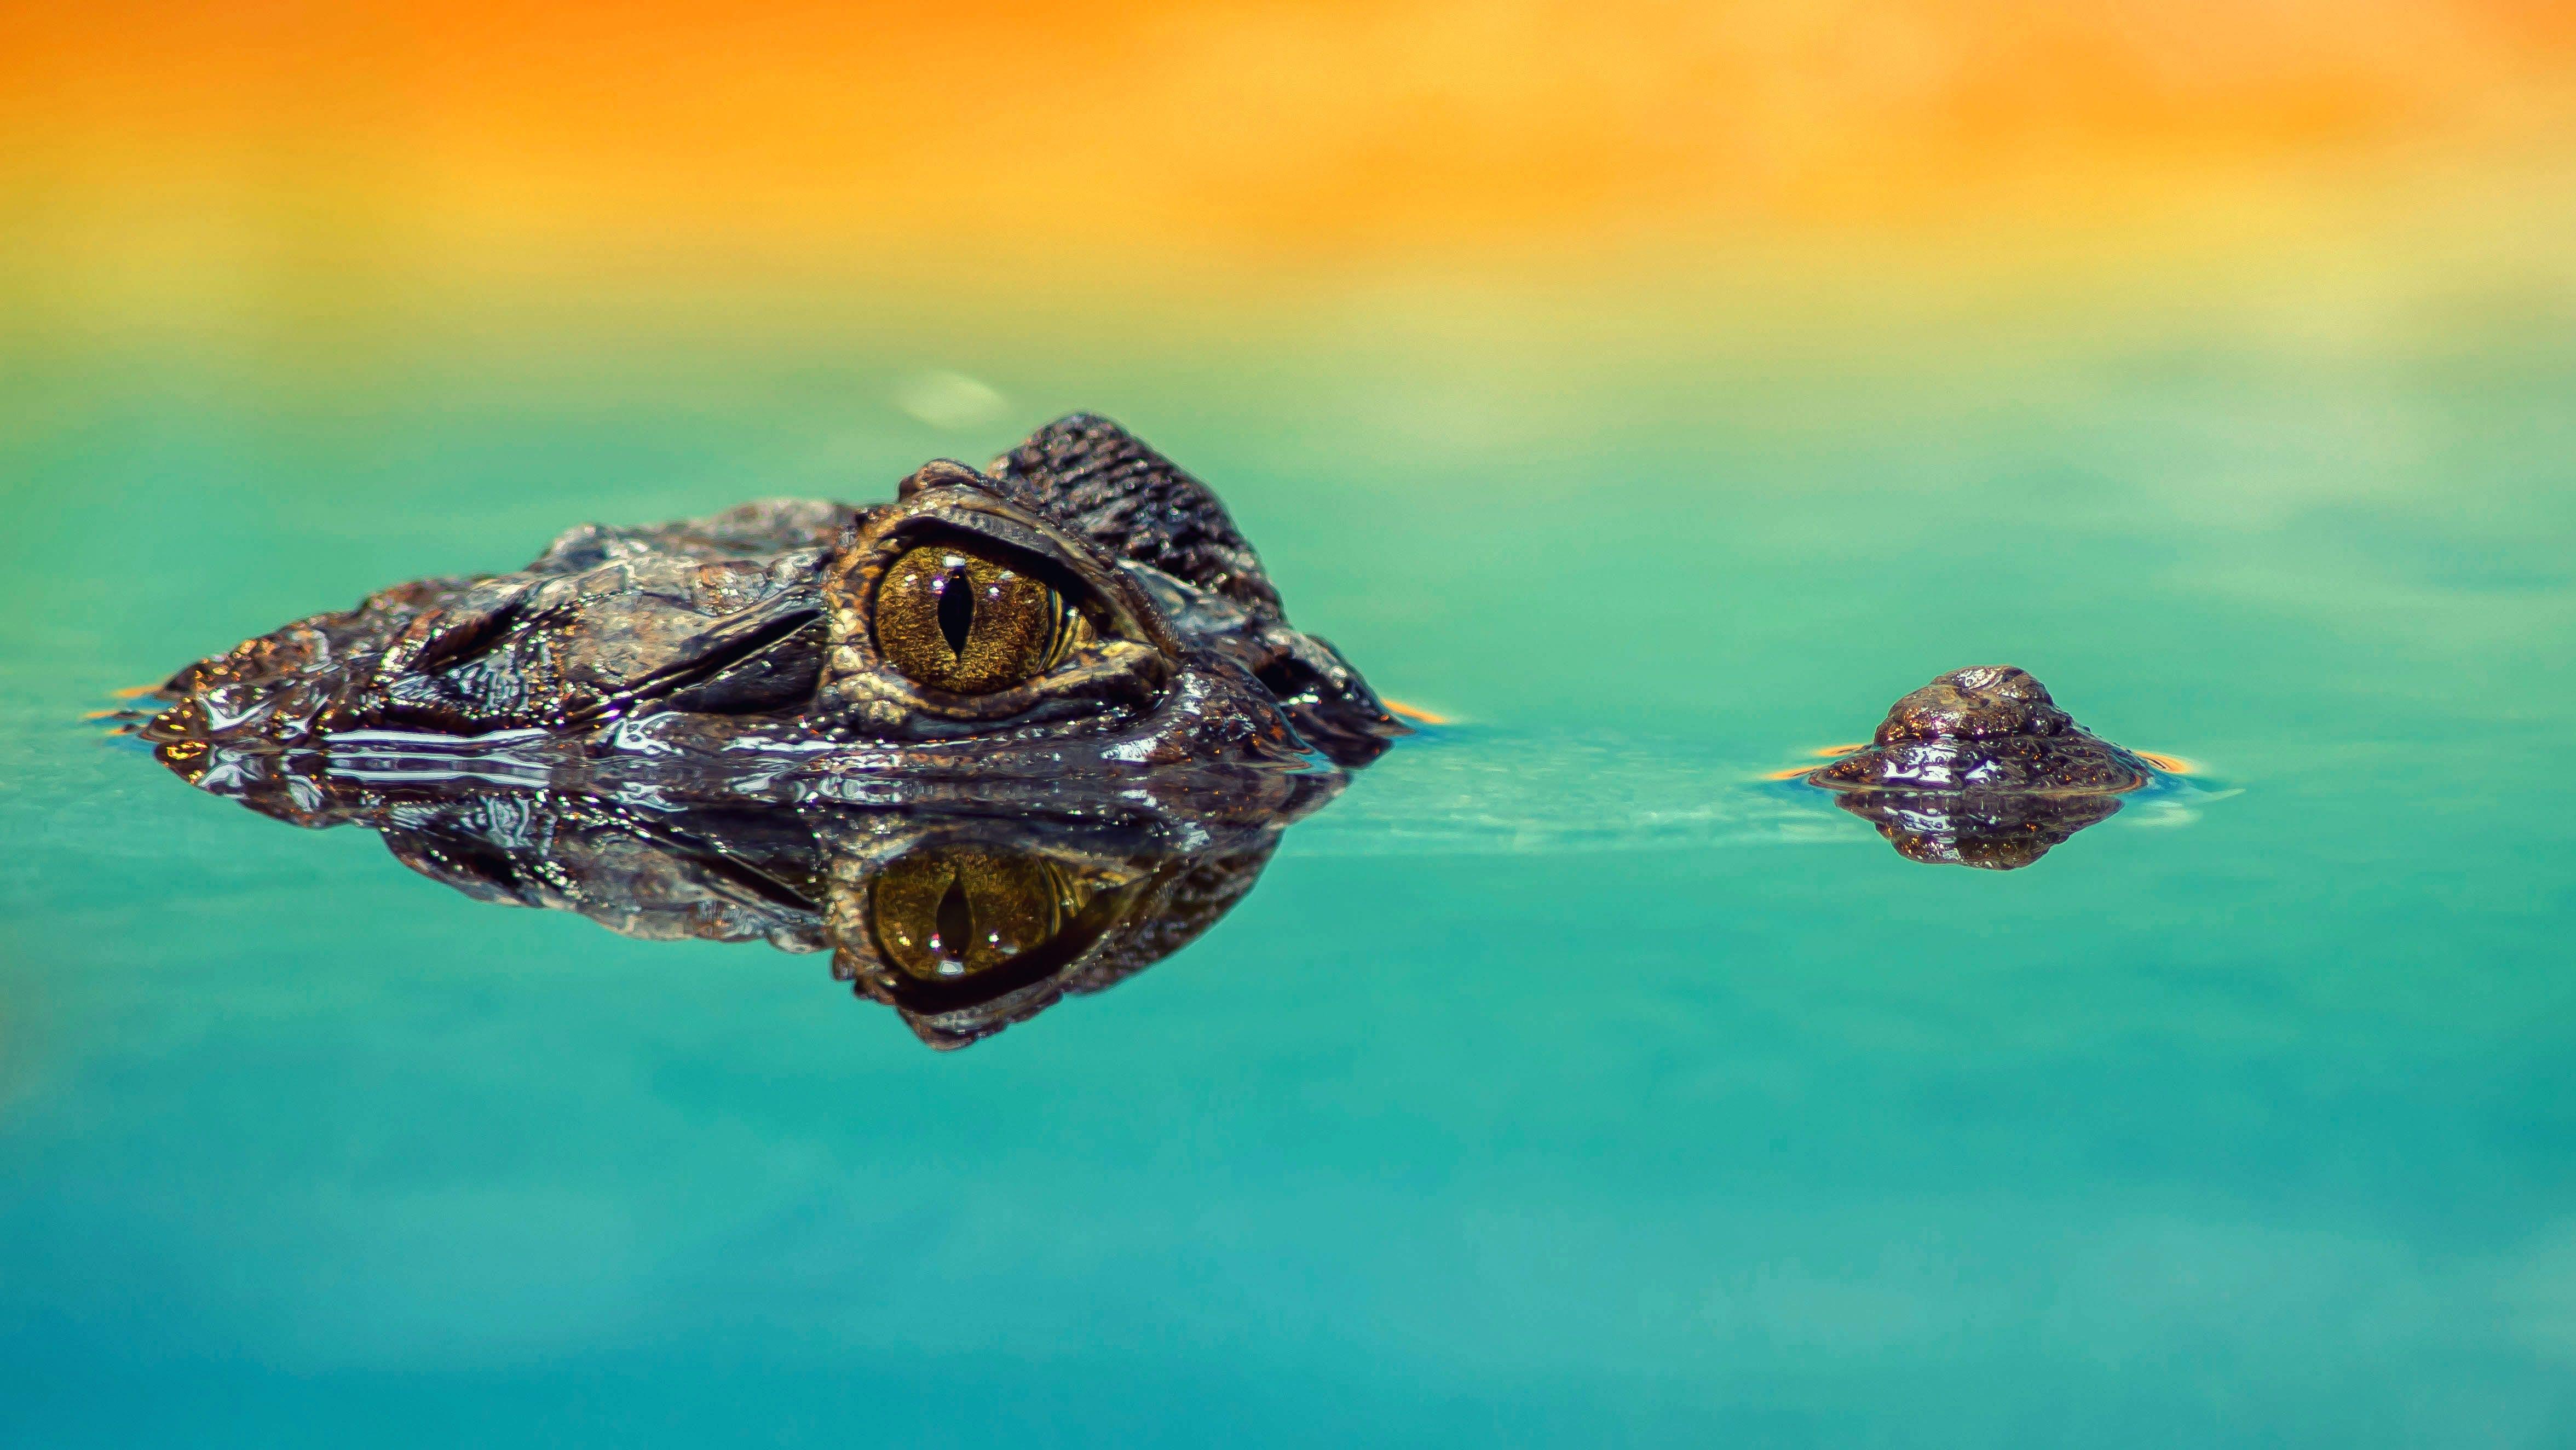 Crocodile on Still Body of Water